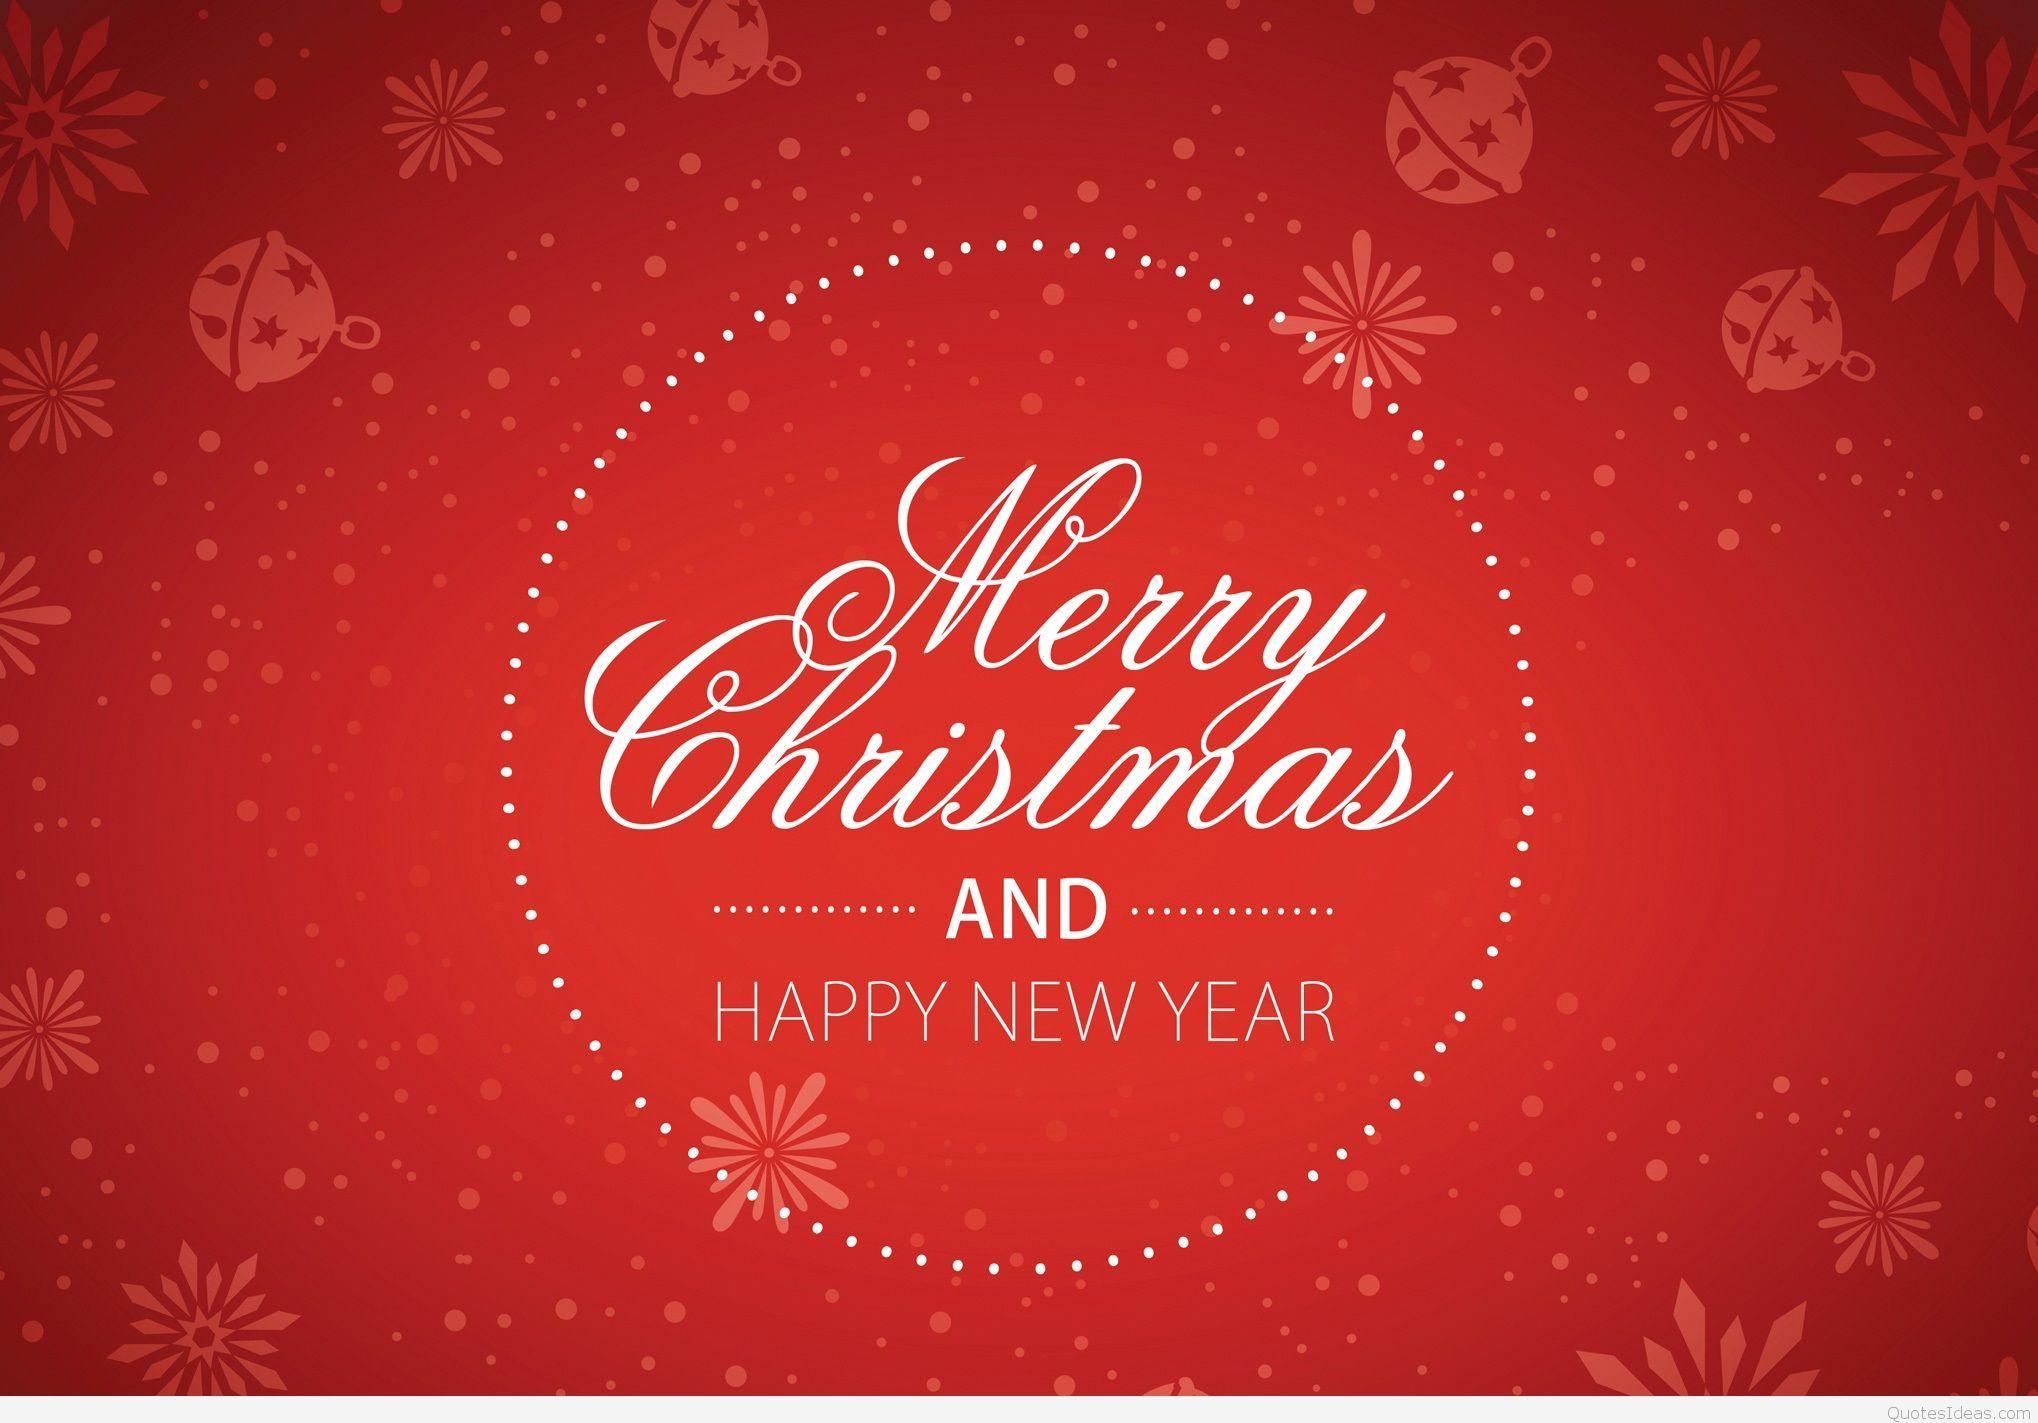 merry christmas happy new year desktop background | Merry Christmas | Pinterest | Desktop ...